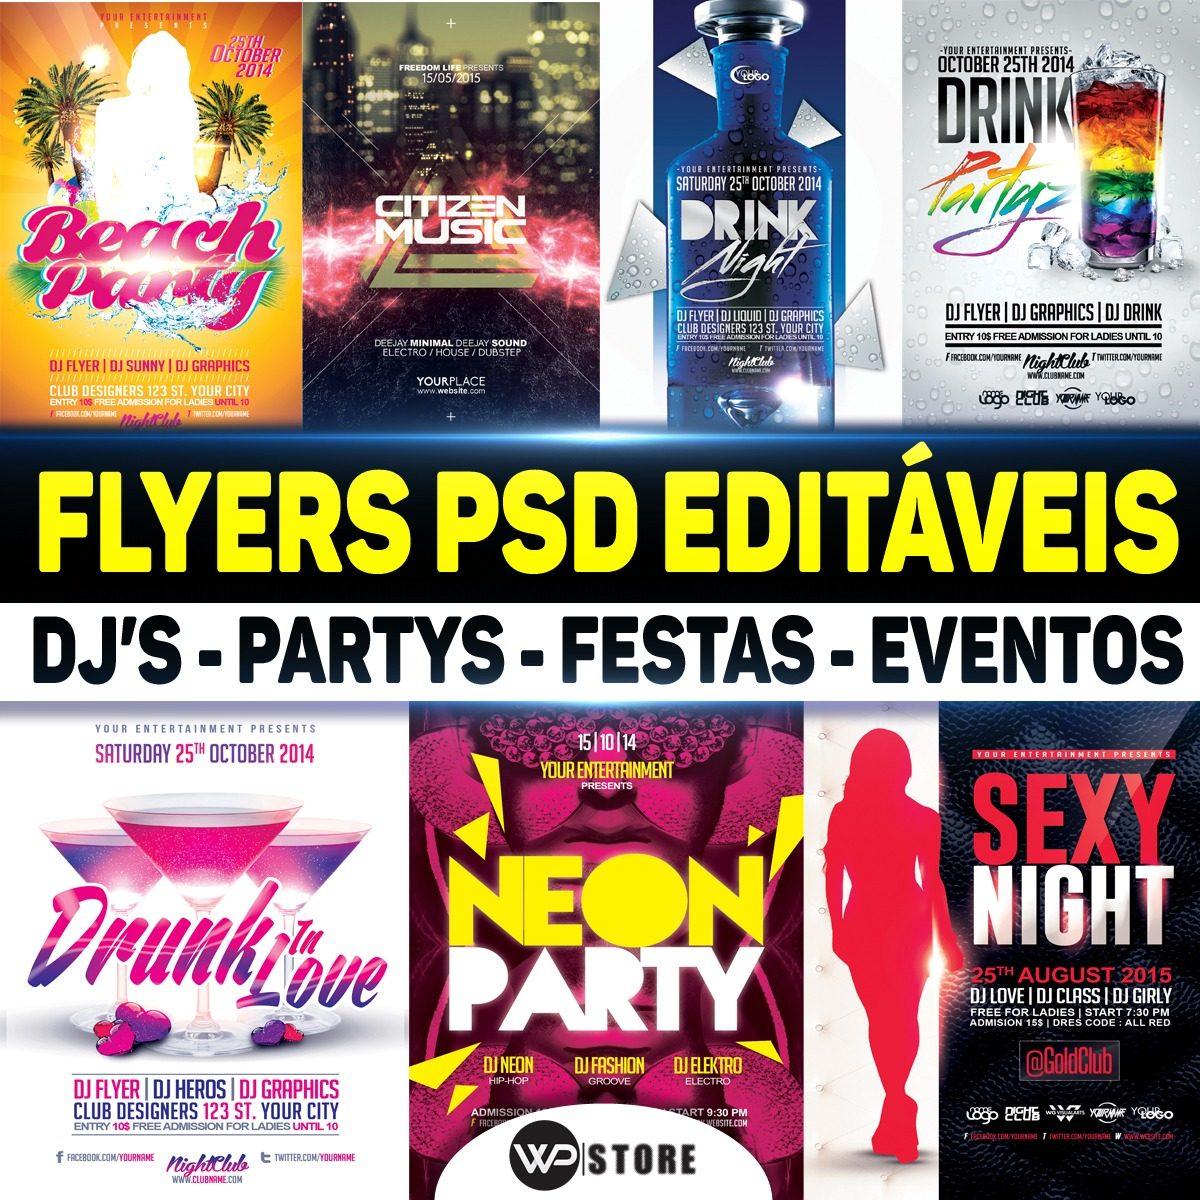 Pack 100 Flyers Templates Editaveis Psd Partys Djs Festas R 12